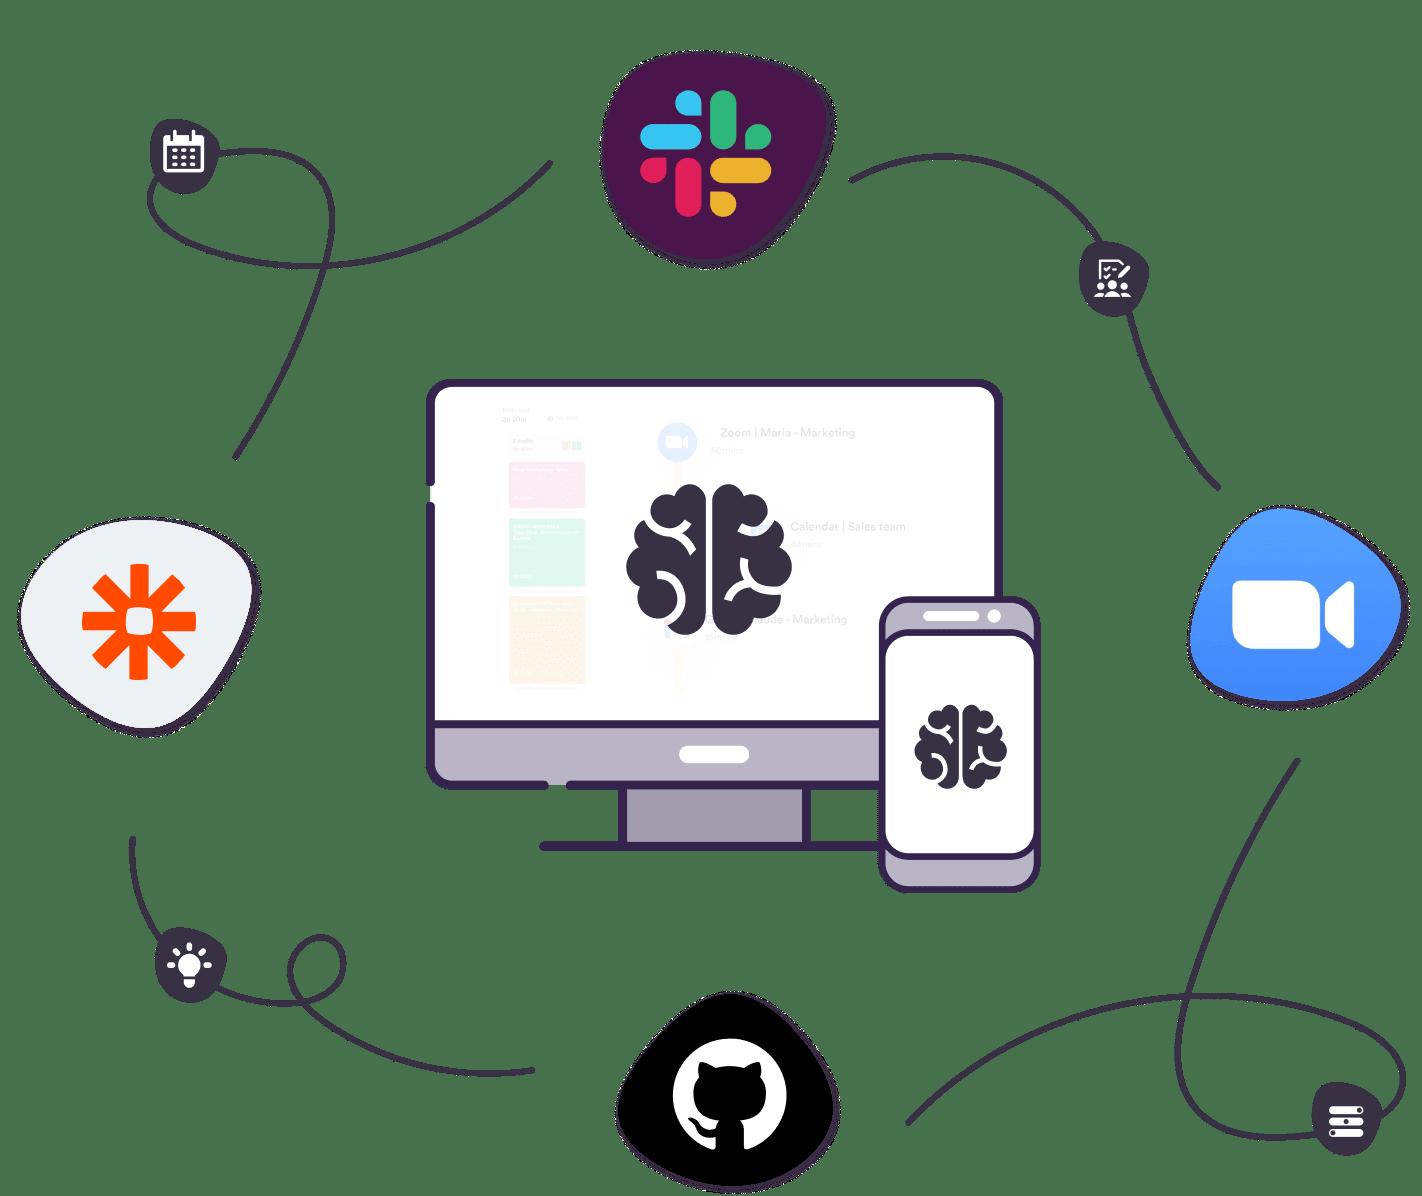 Memory app integrations